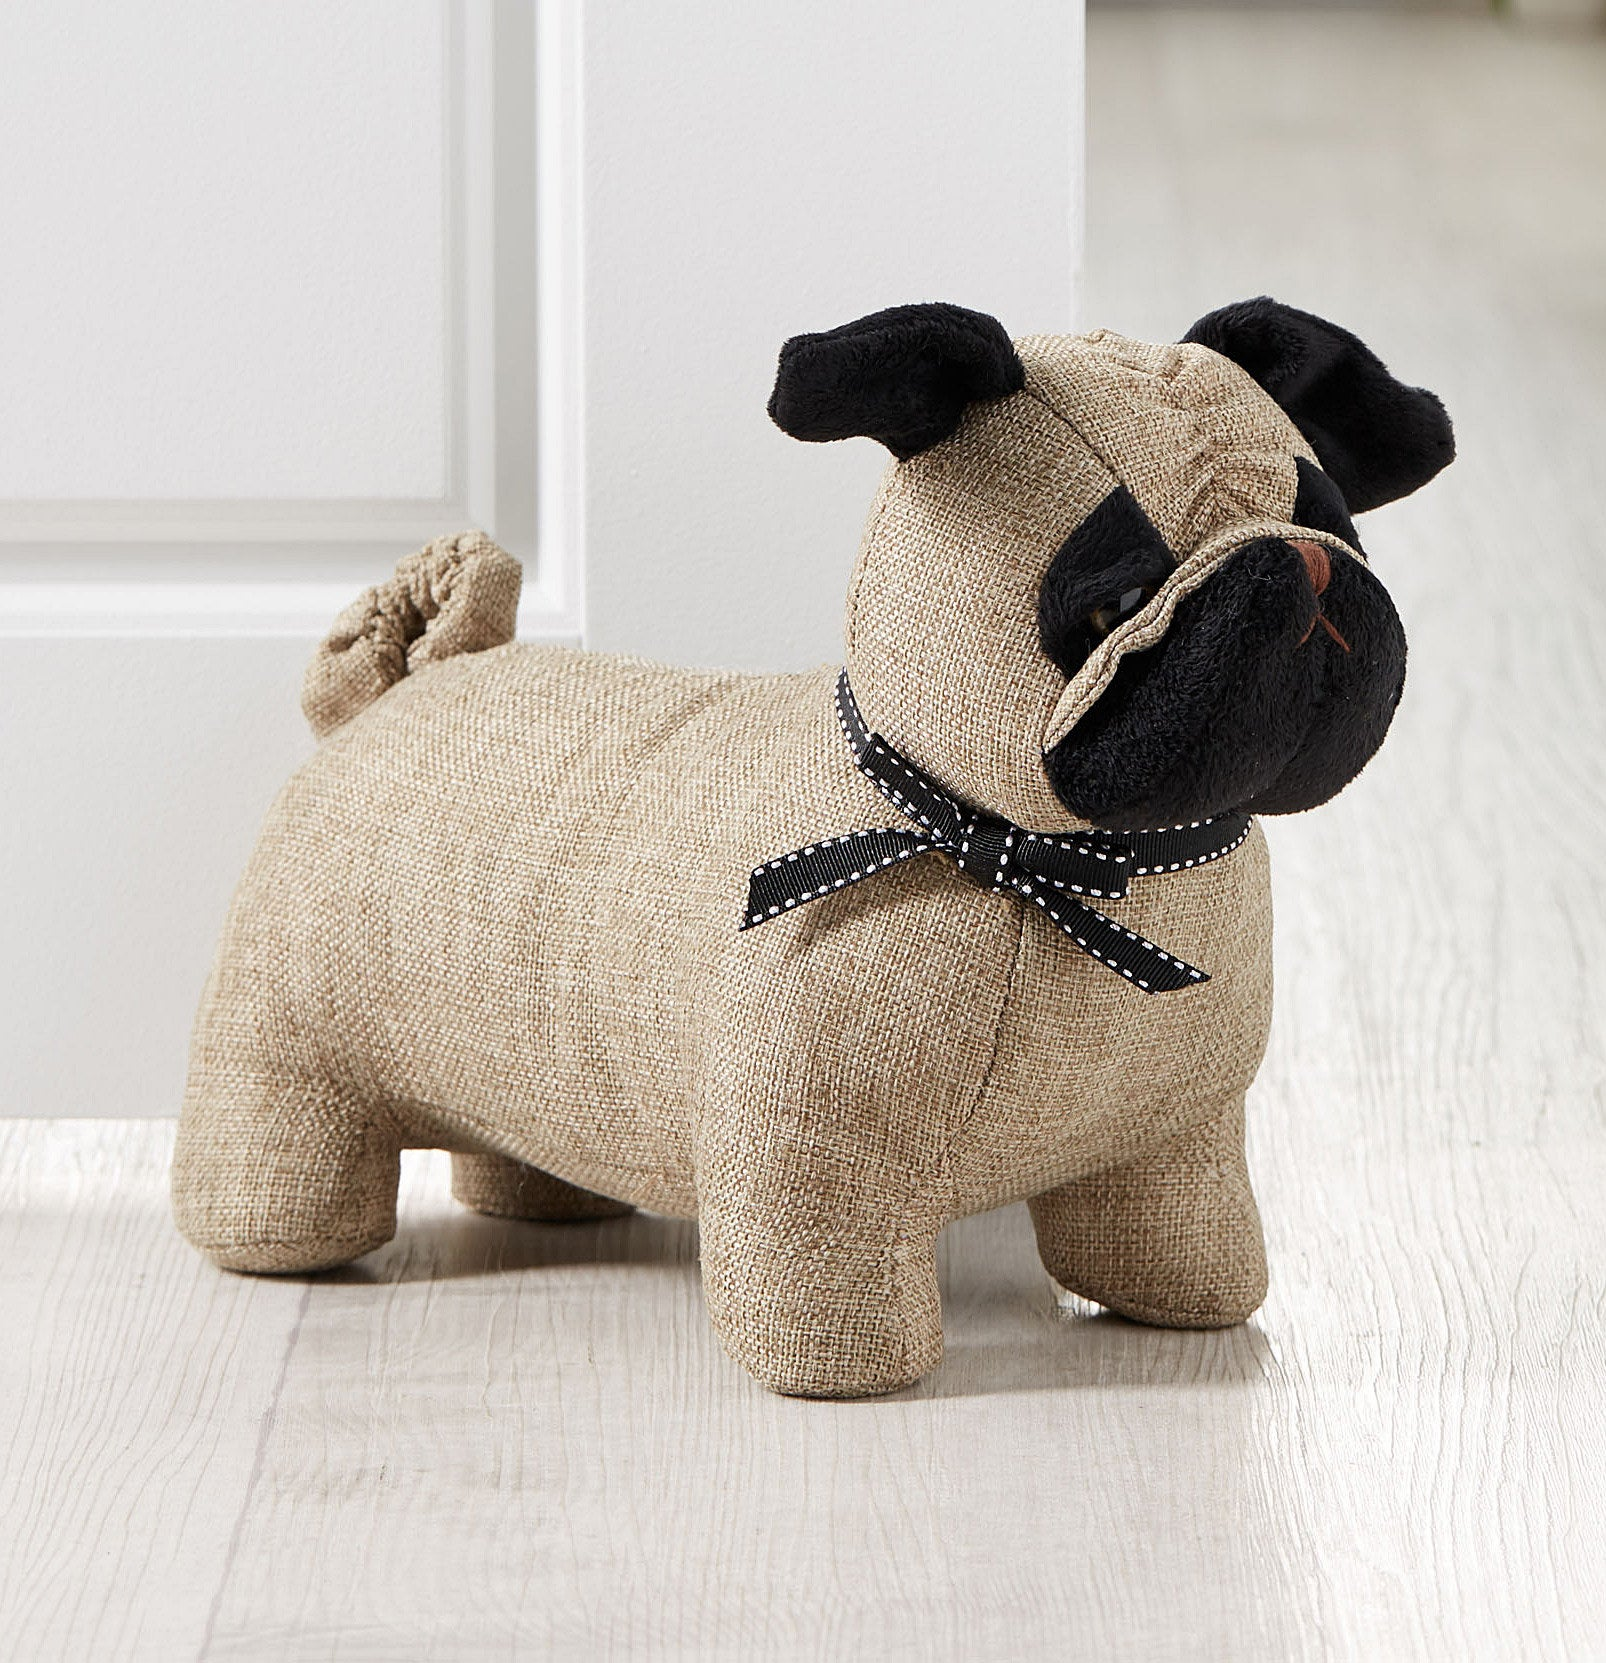 A dog-shaped door stopper holding open a door